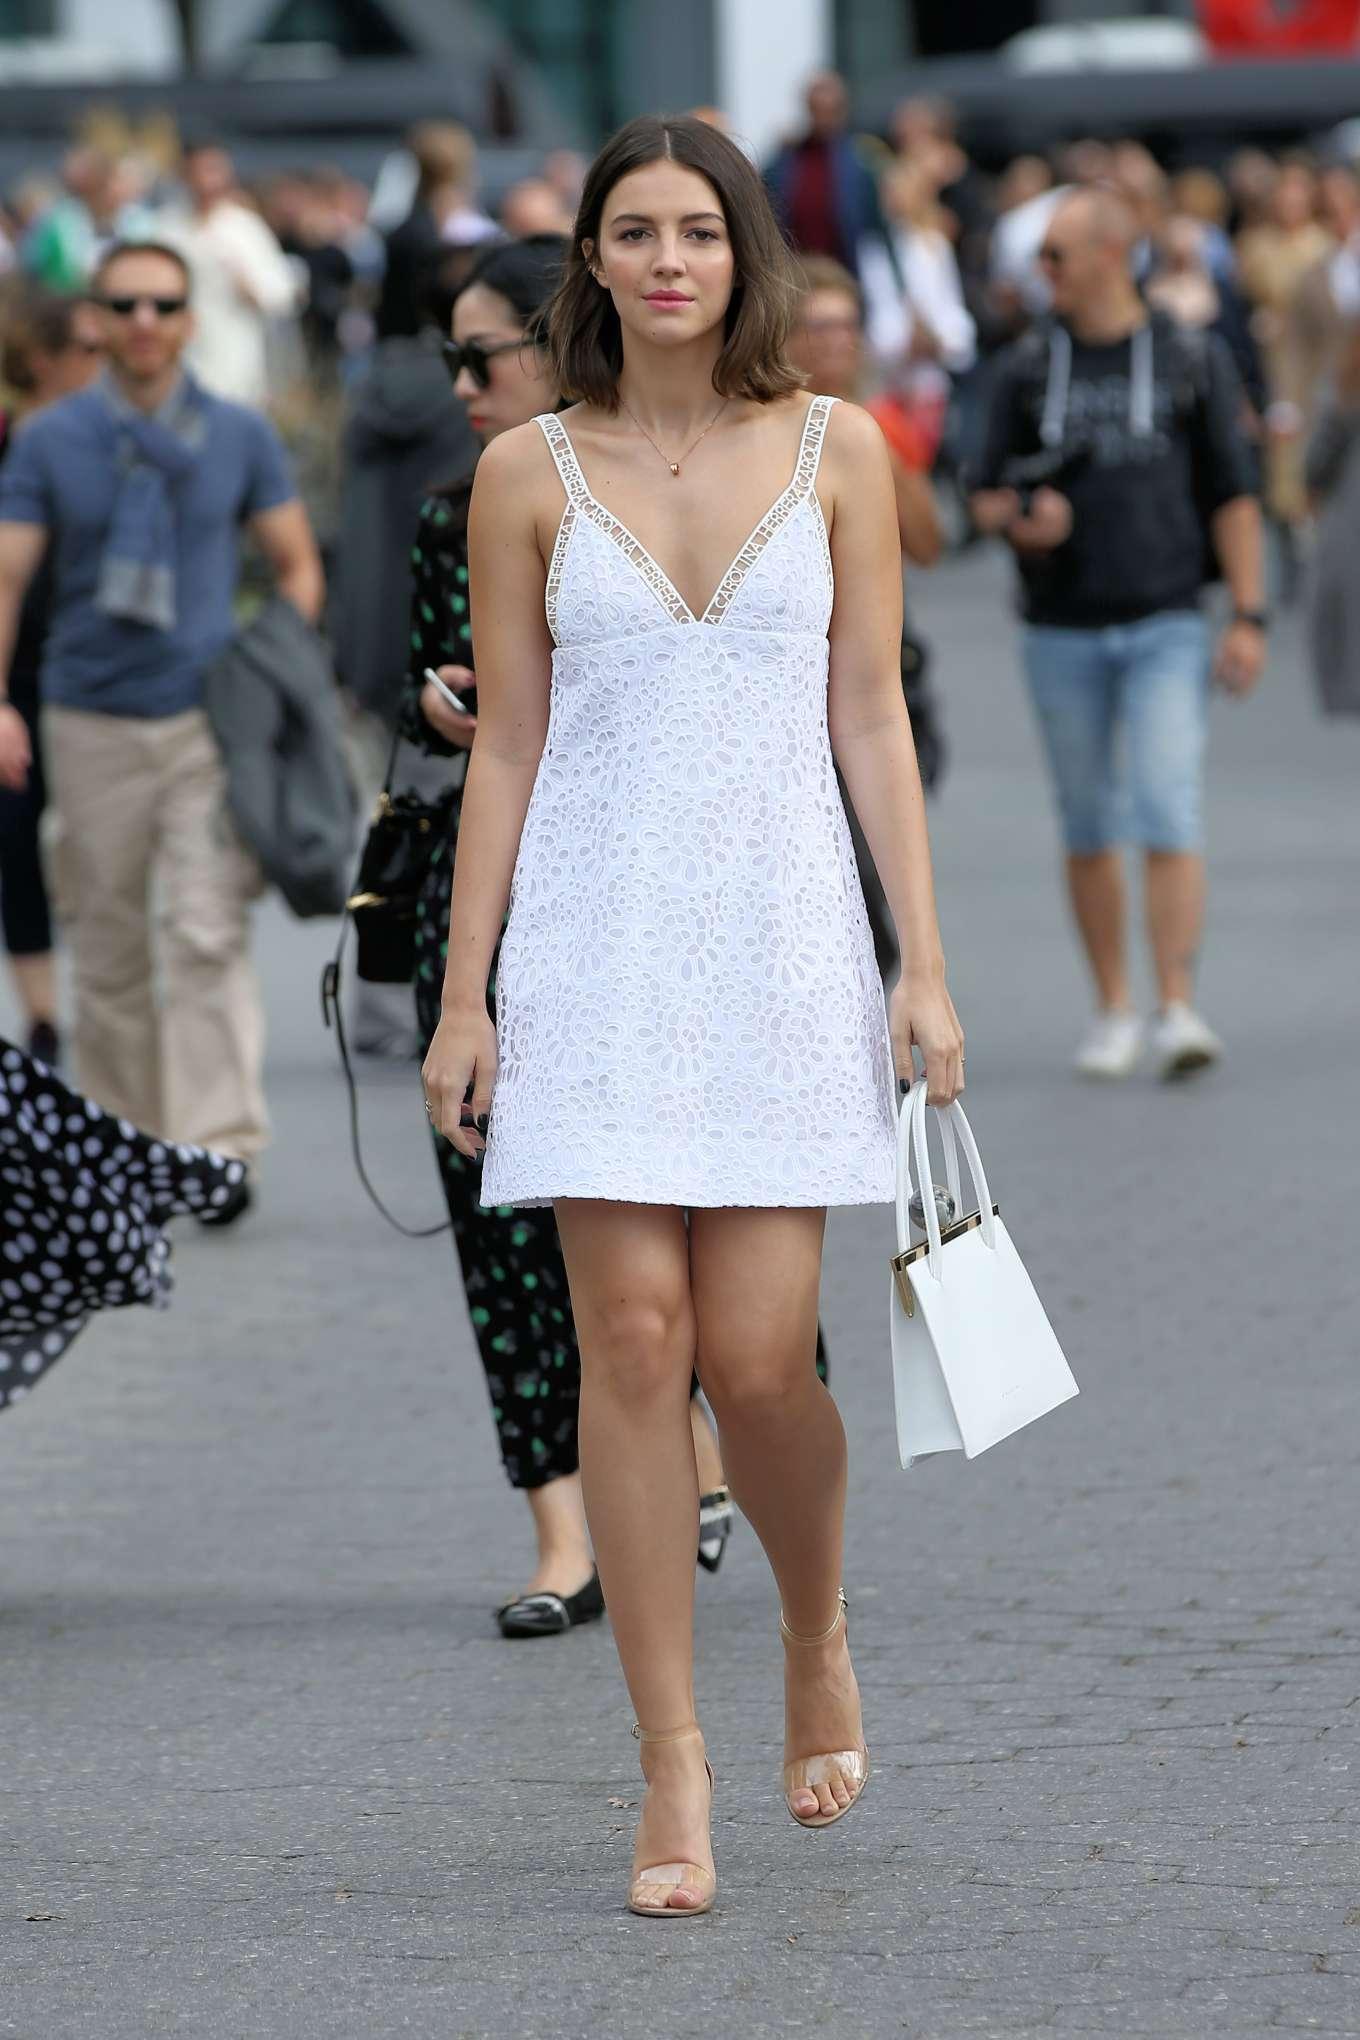 Ella Hunt - Attends Carolina Herrera SS20 Fashion Show in New York